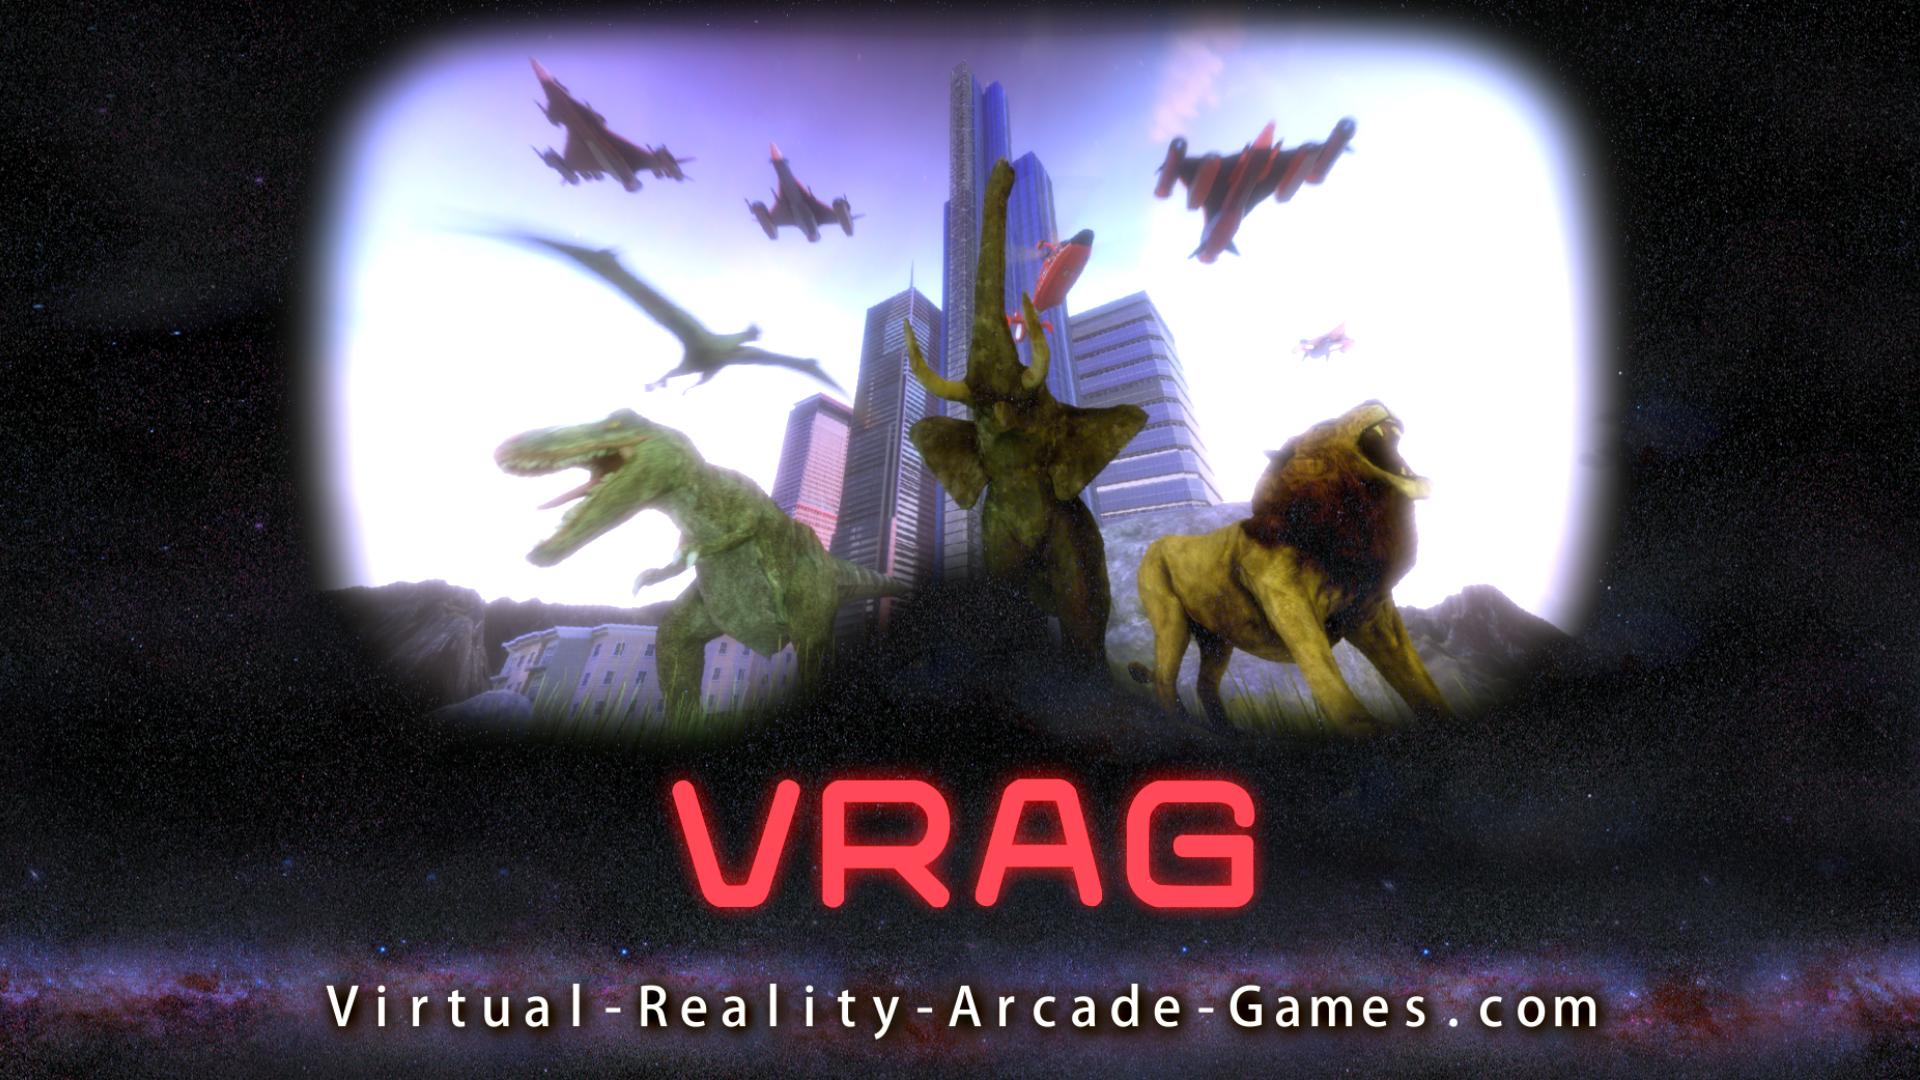 virtual-reality-arcade-games